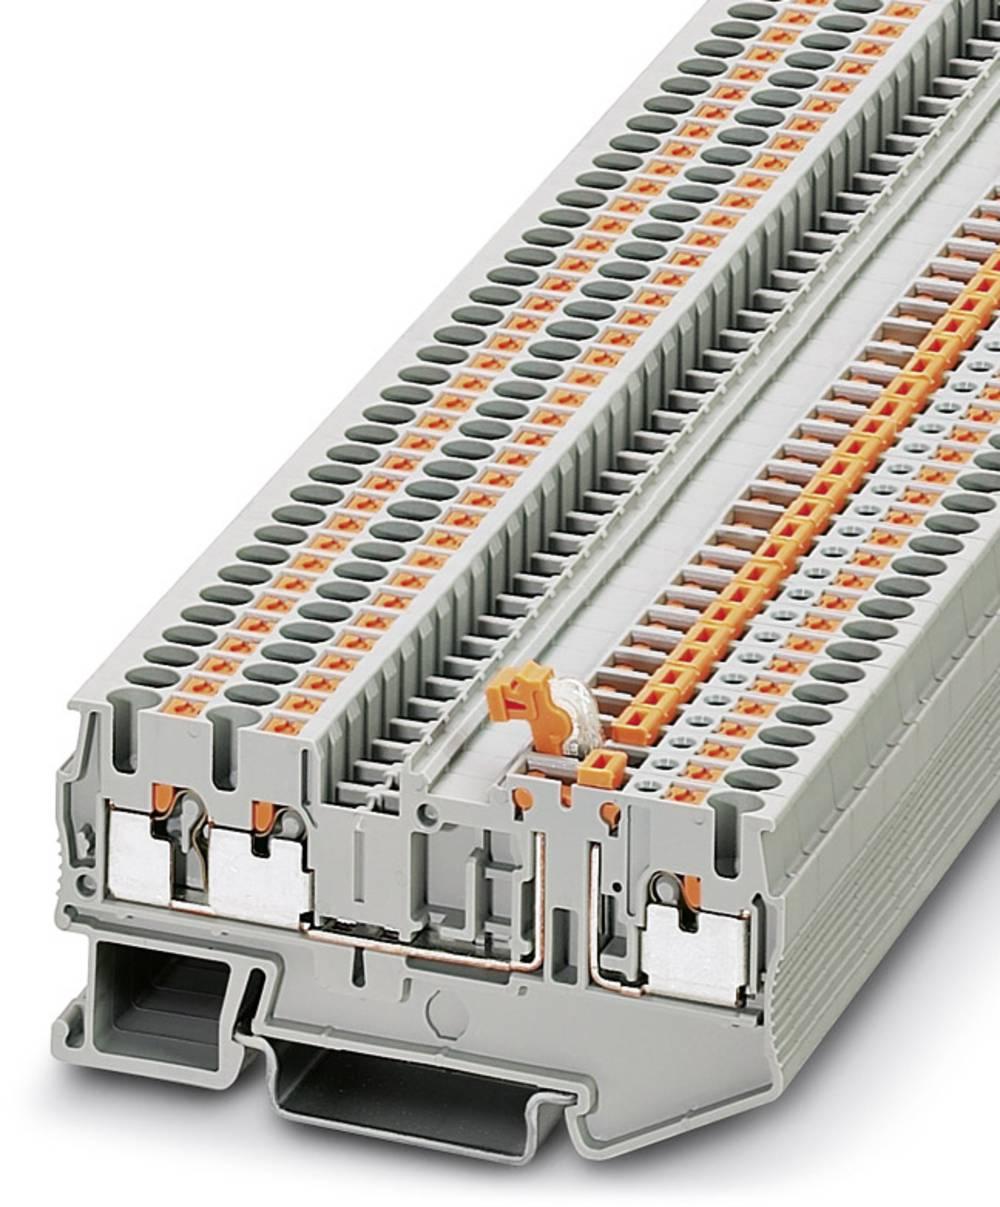 Ark / modulopbyggede afbryde terminal PT 2.5-TWIN-MT Phoenix Contact PT 2,5-TWIN-MT Grå 50 stk